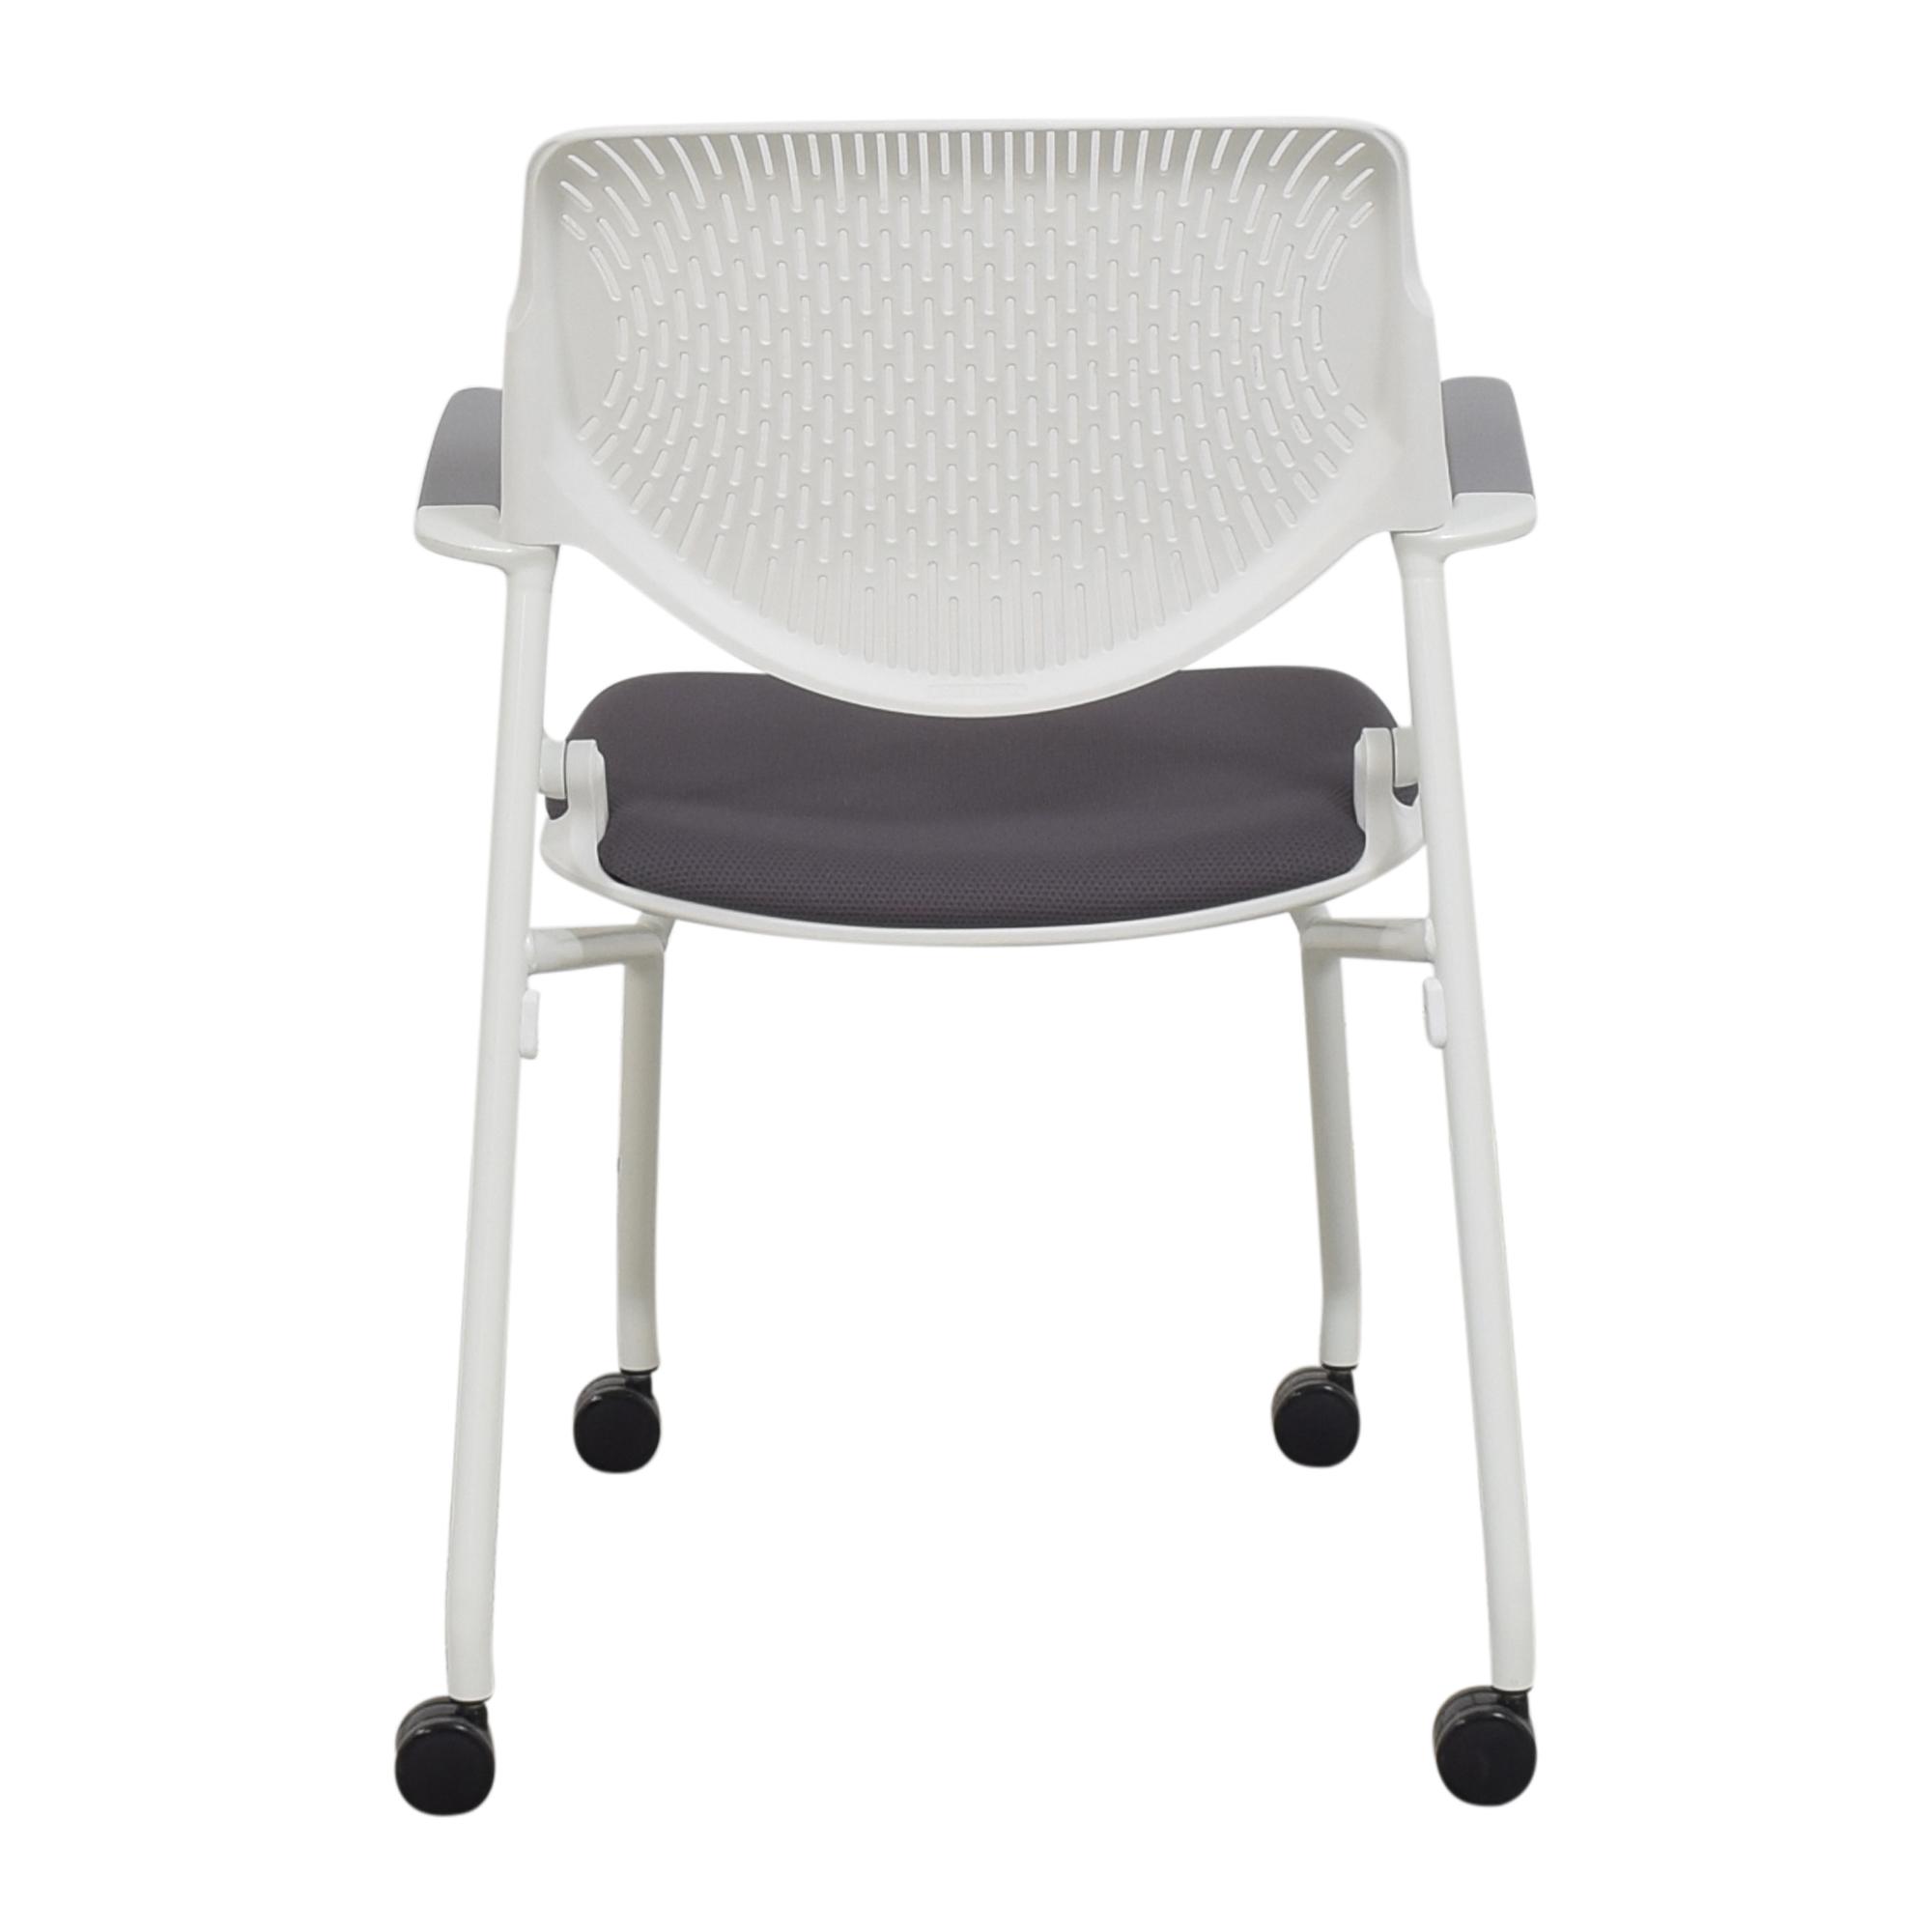 buy Room & Board Runa Nesting Chair by Okamura Room & Board